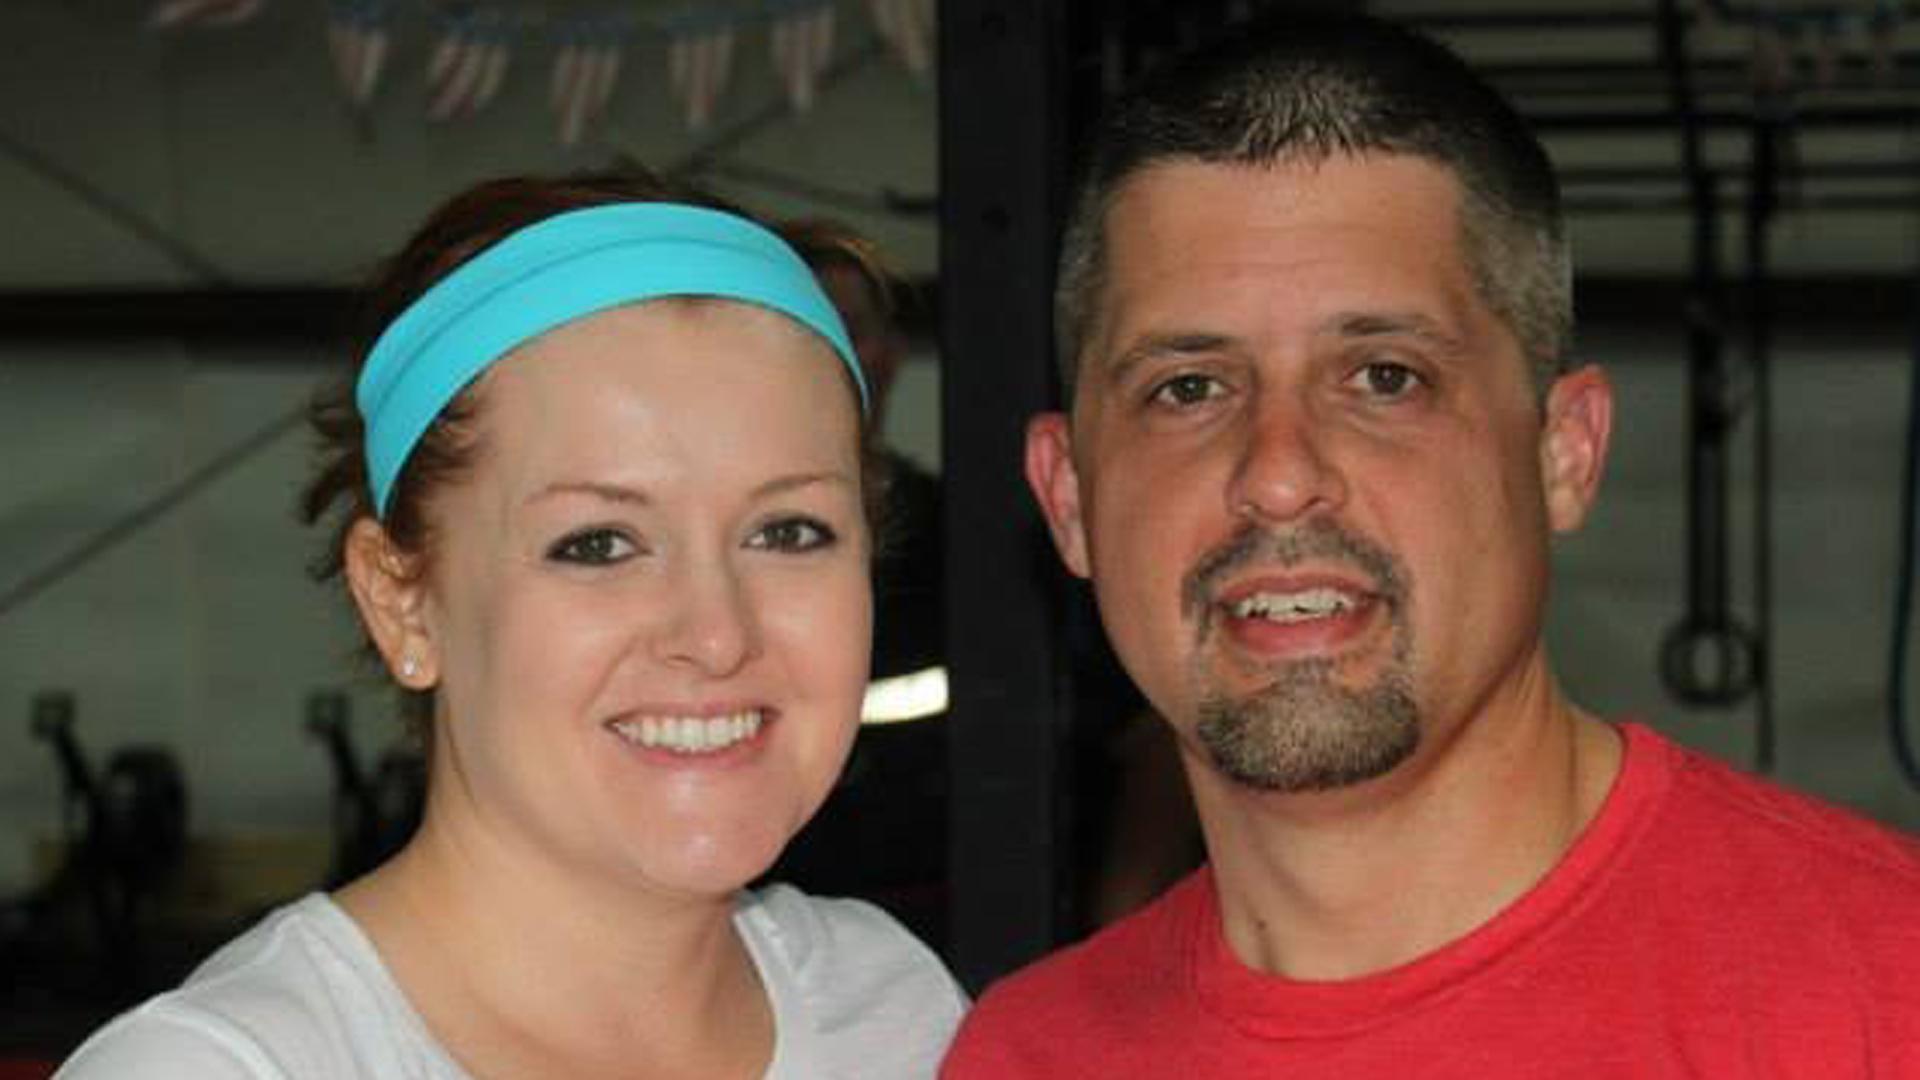 Terra and Josh Pinkard appear in an undated photo found on Facebook. (Credit: Facebook via CNN)